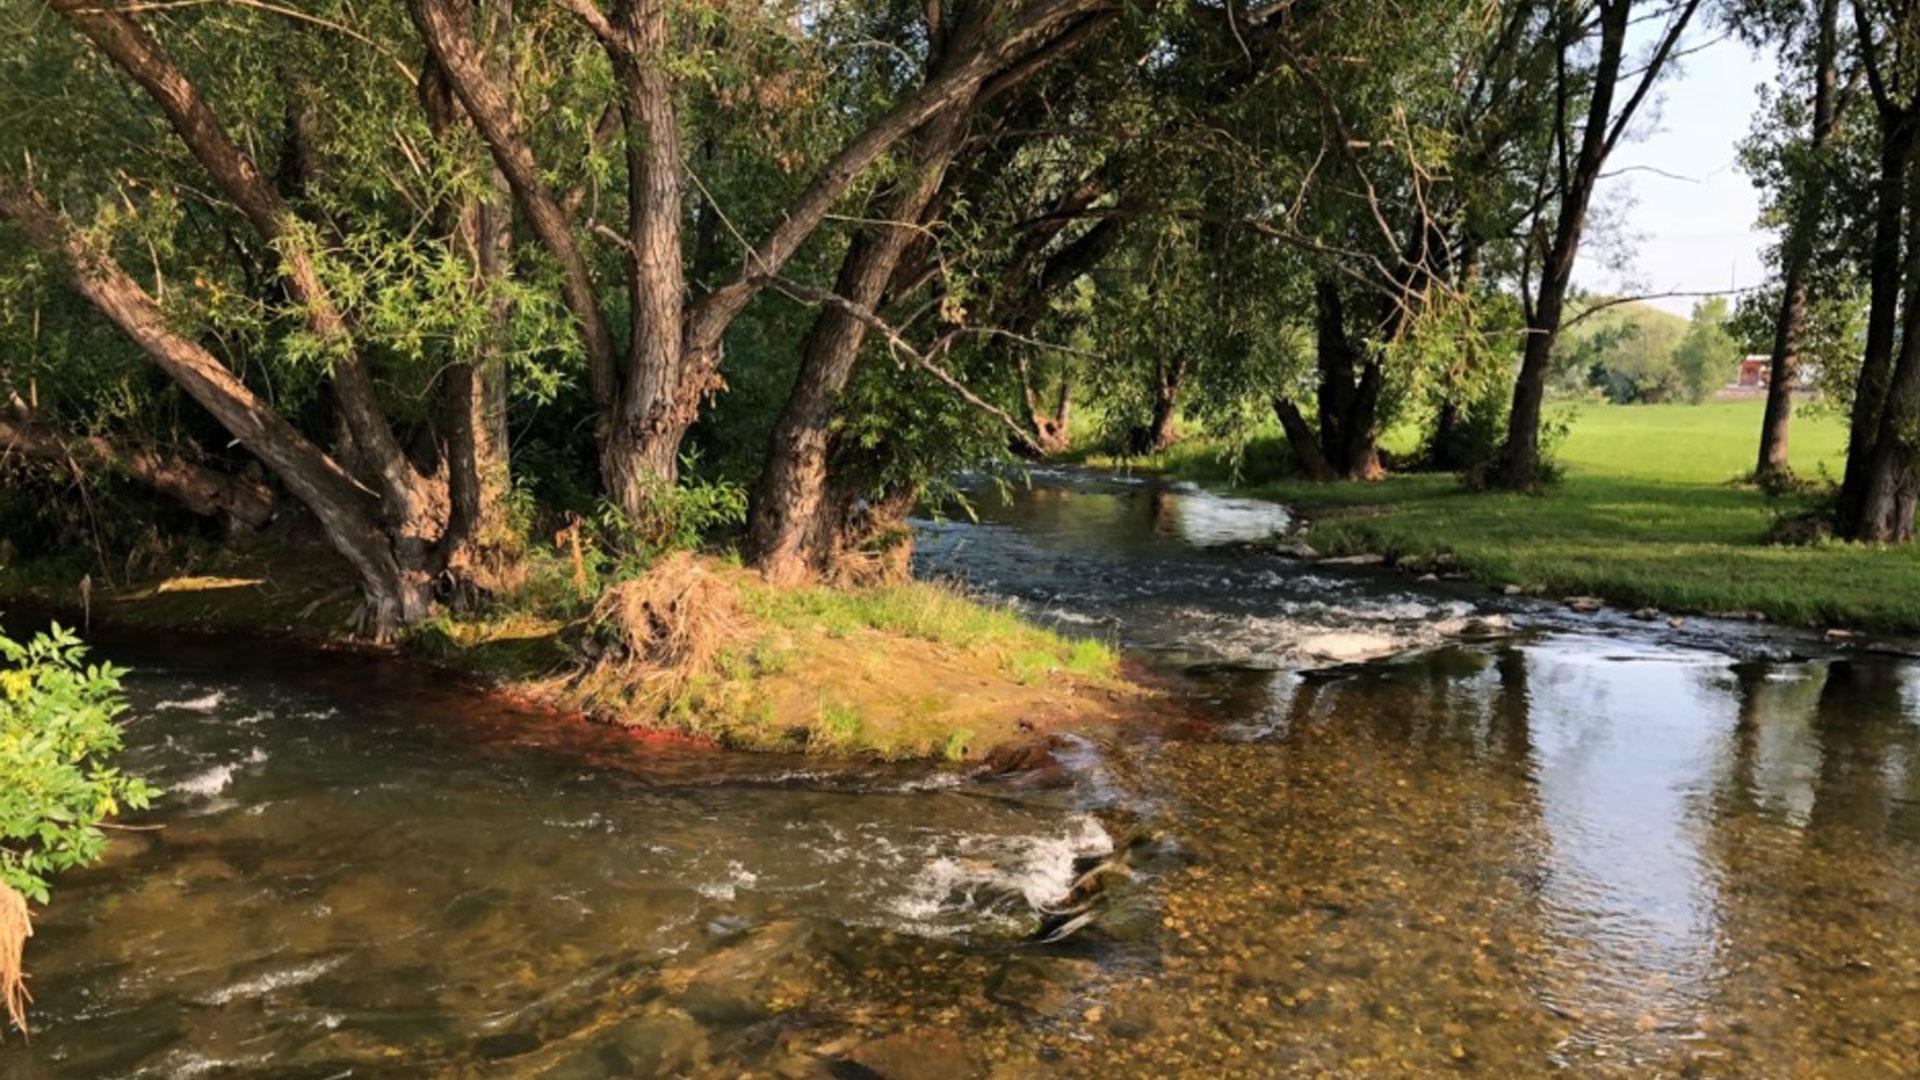 KELO River